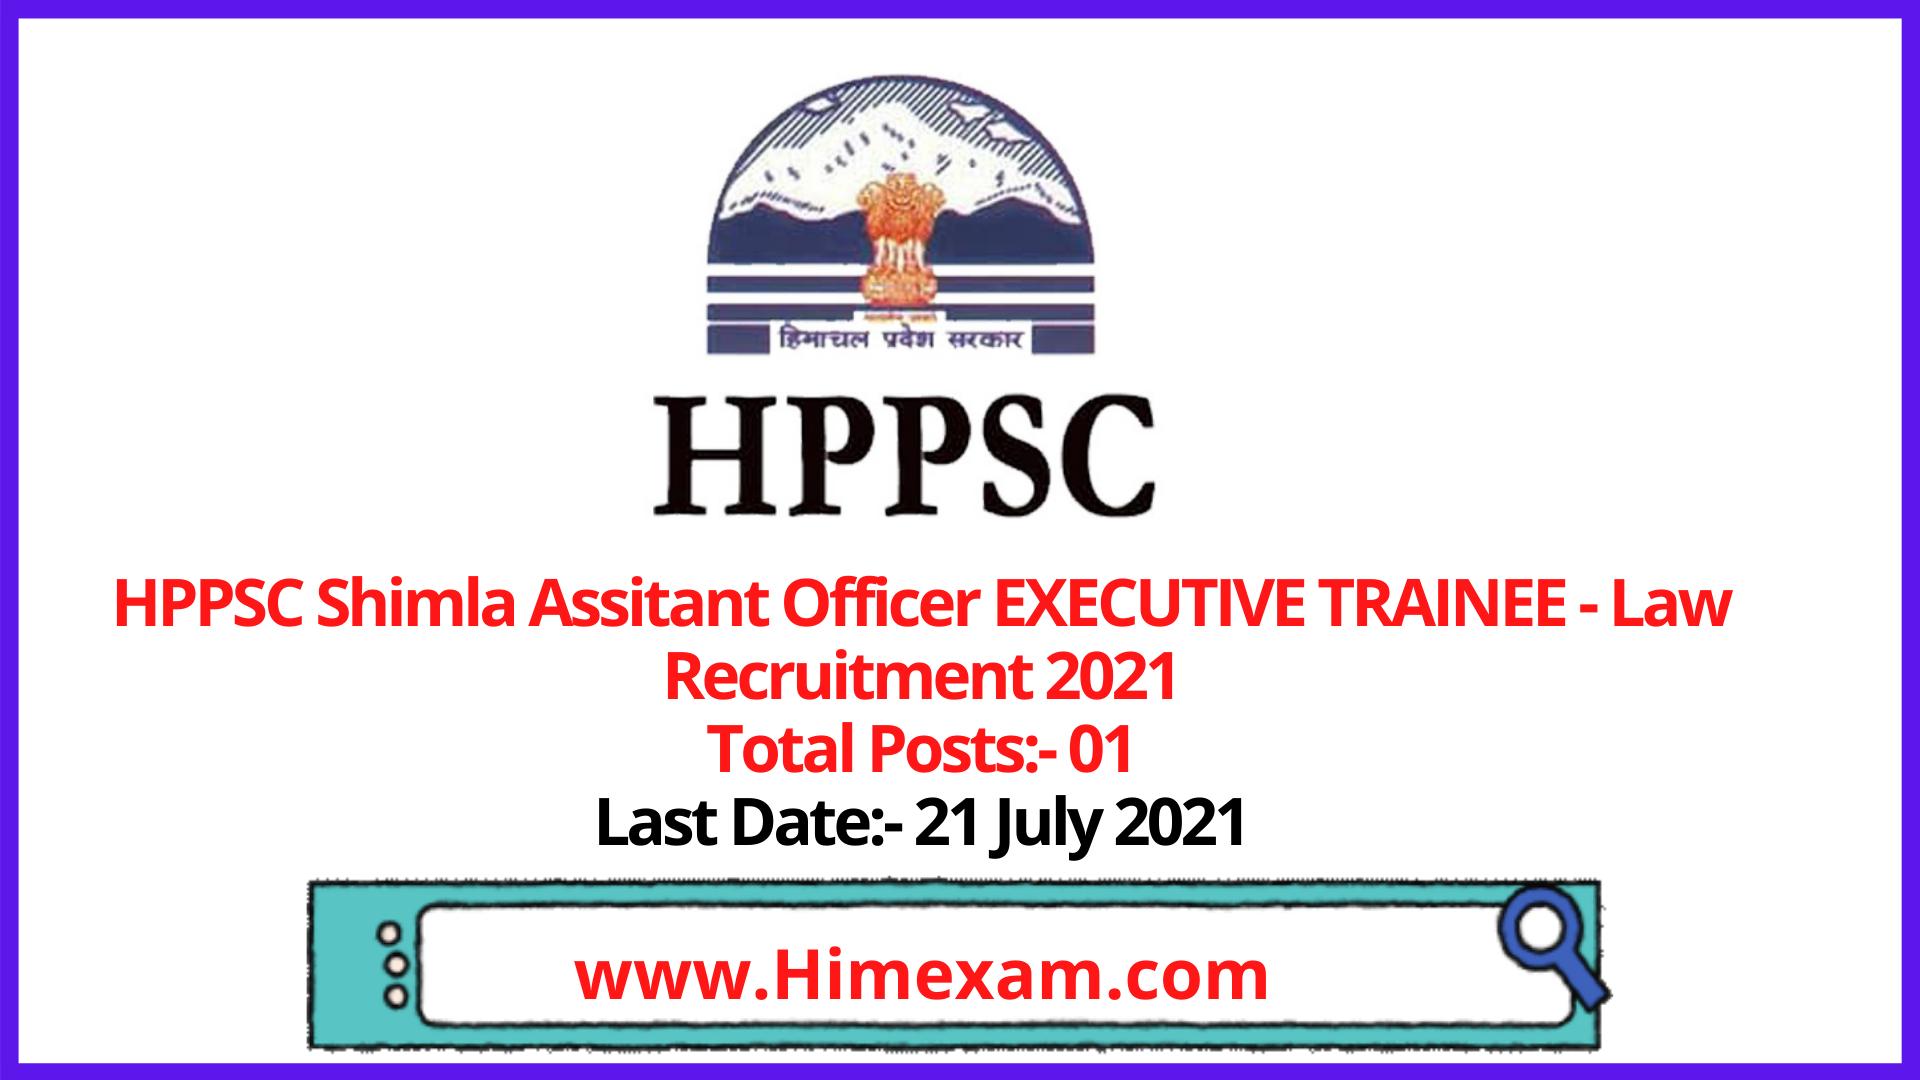 HPPSC Shimla  Assitant Officer EXECUTIVE TRAINEE - Law Recruitment 2021